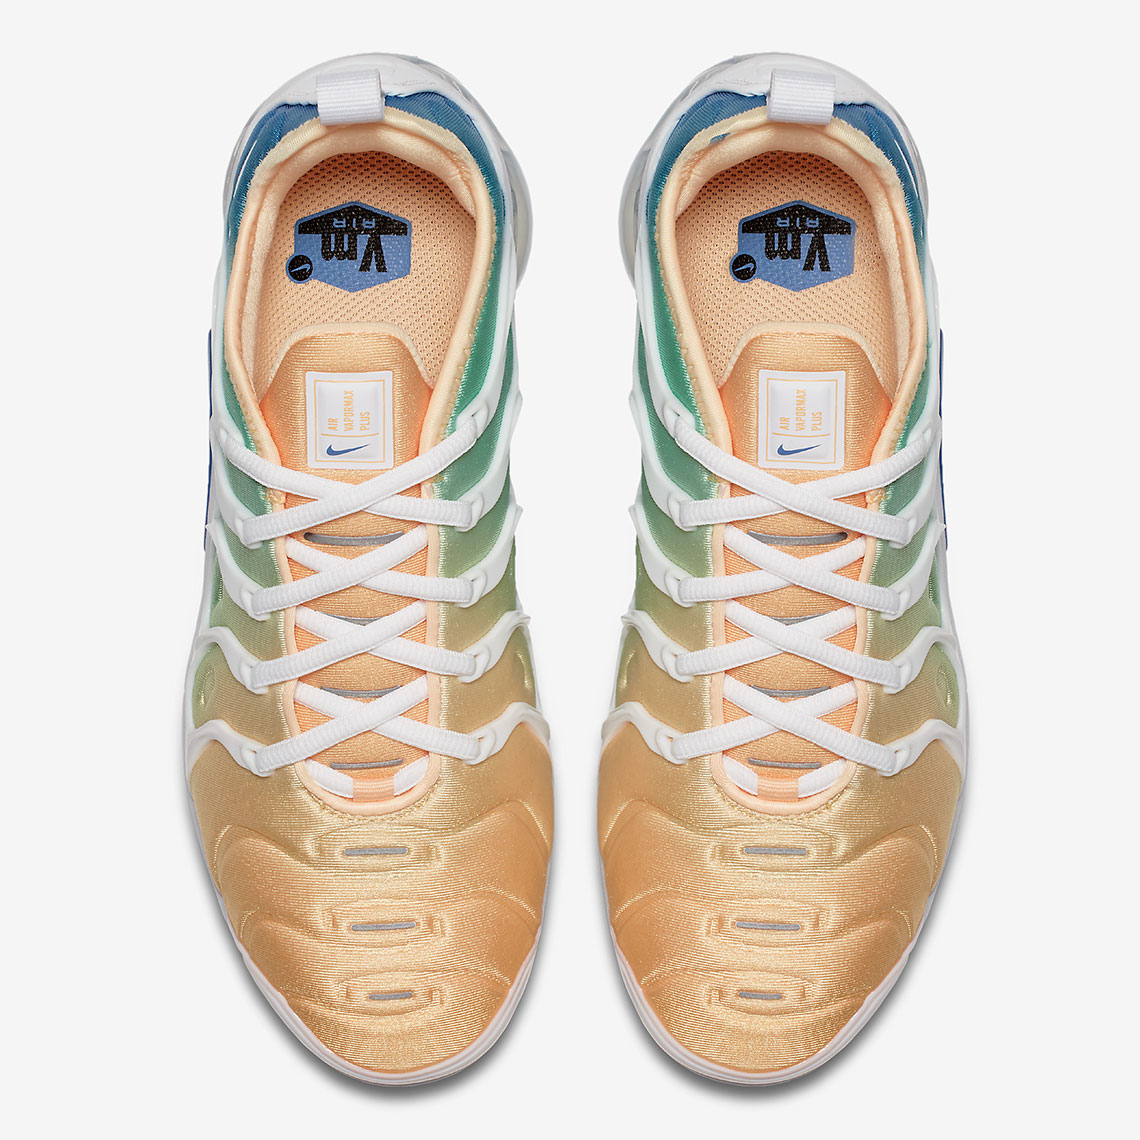 superior quality 8d05f c6b65 Nike Vapormax Plus Women's AO4550-100 | SneakerNews.Com